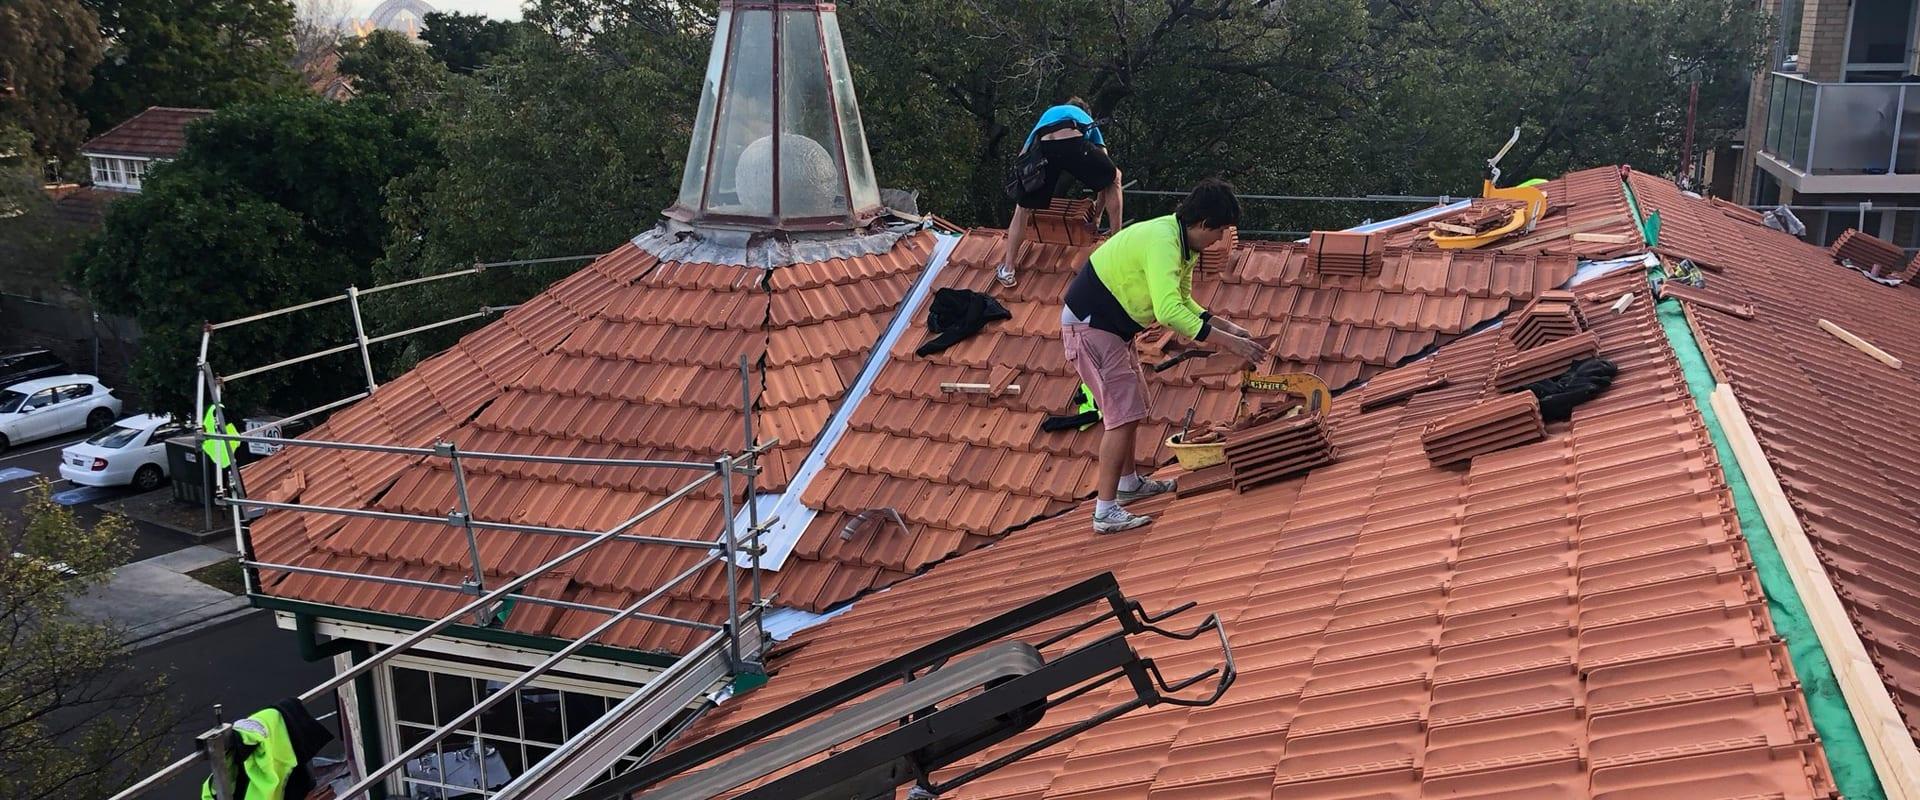 Roof leak who to call Australia